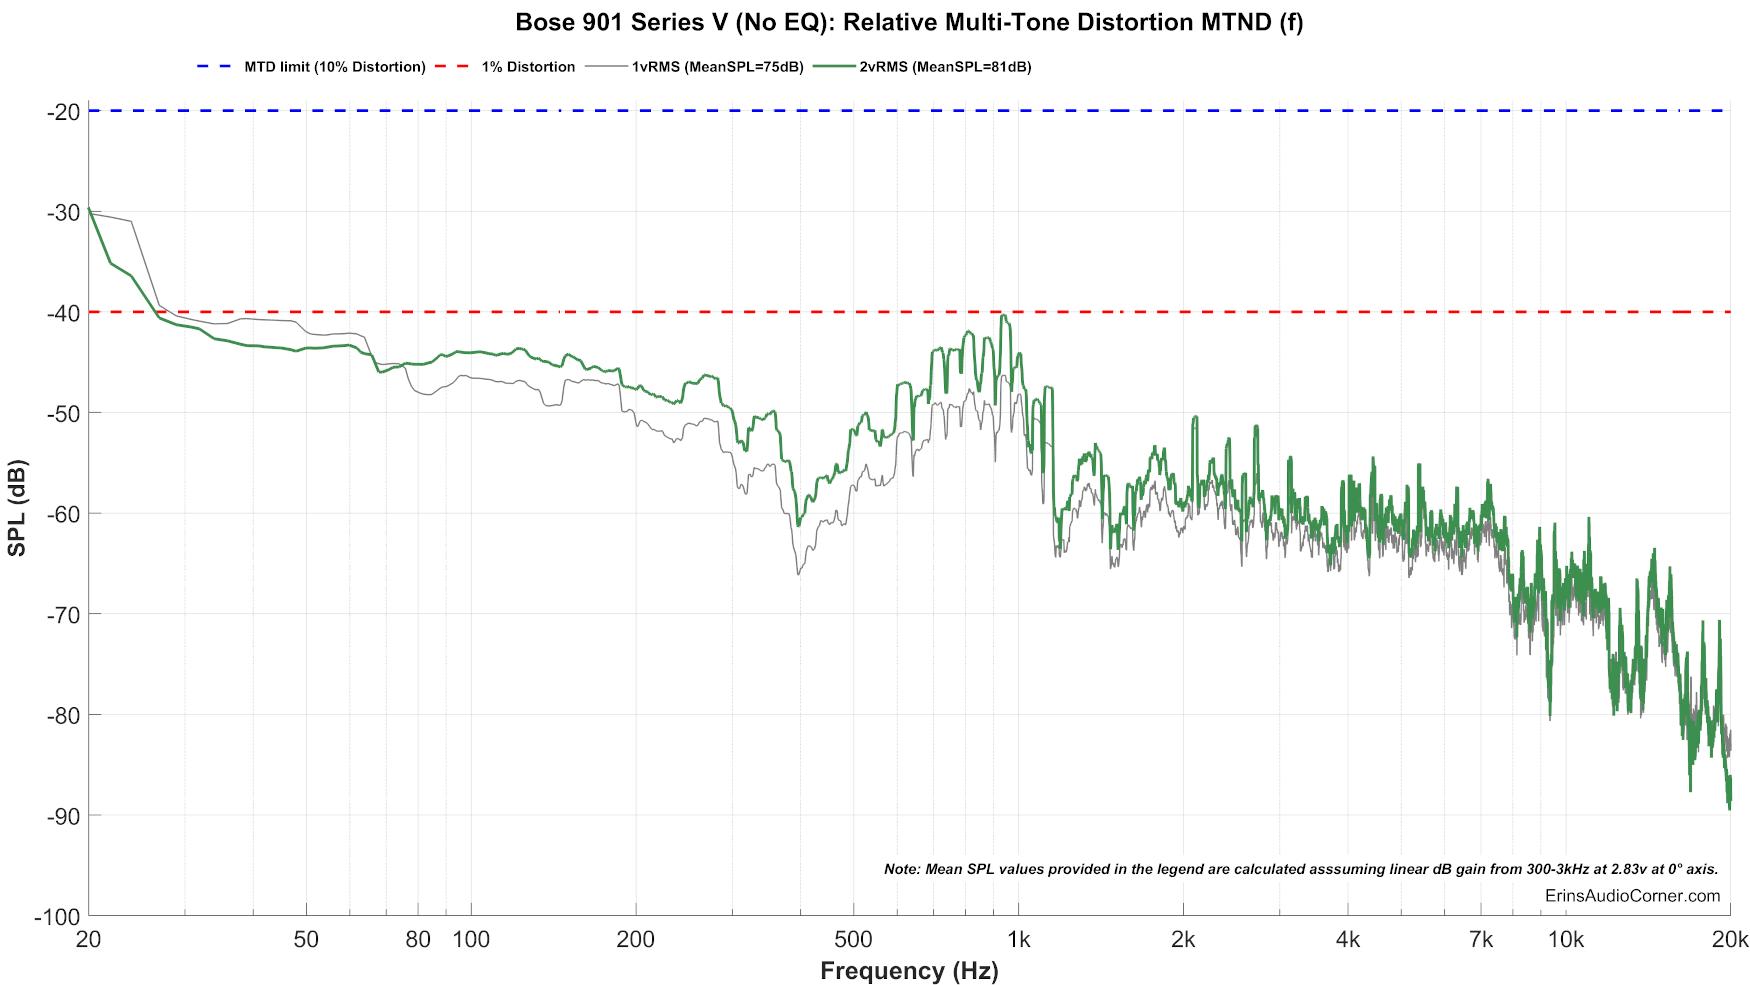 Bose%20901%20Series%20V%20(No%20EQ)_MTON_Distortion%2020.png